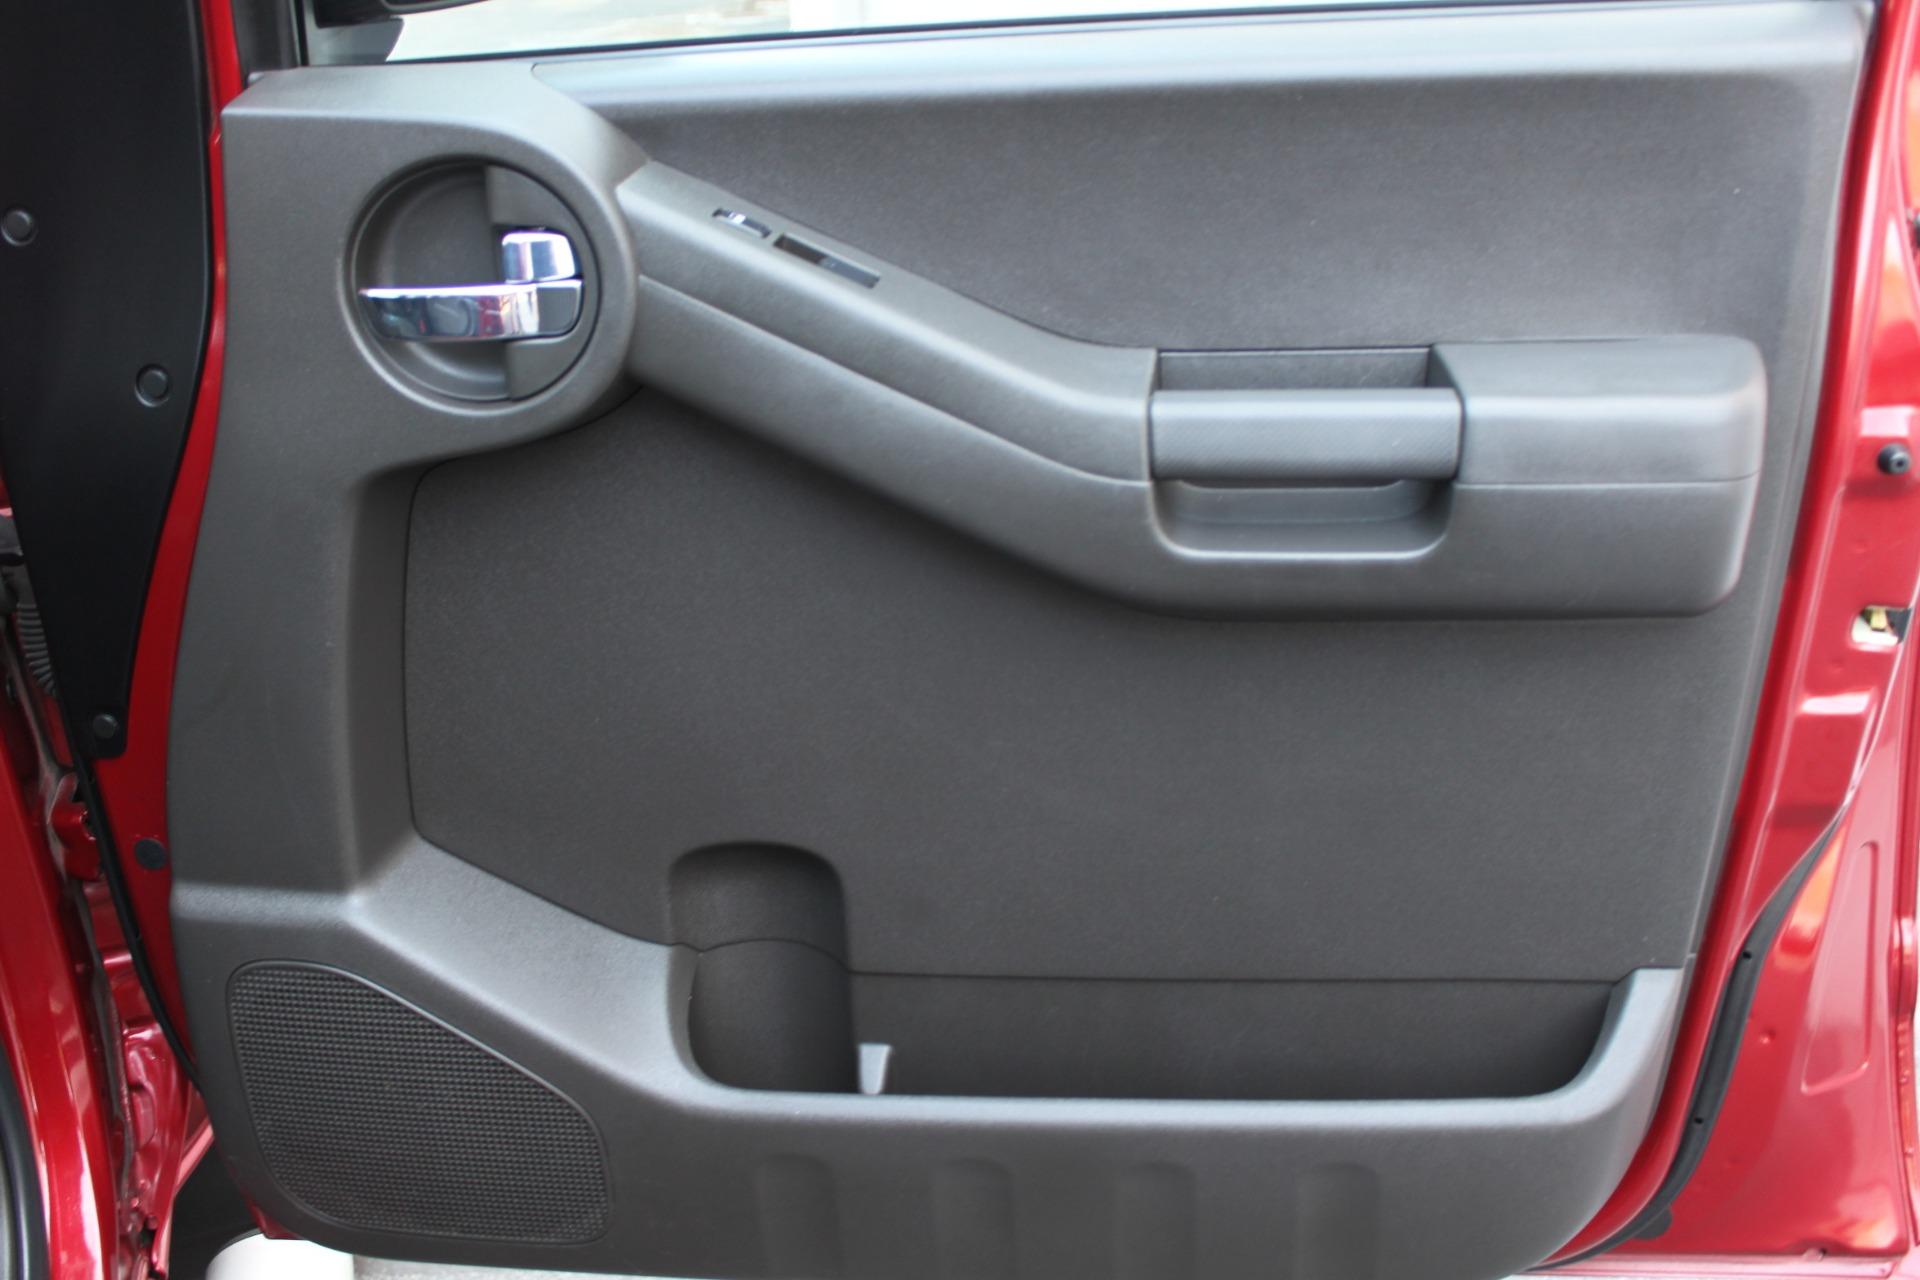 Used-2006-Nissan-Xterra-Off-Road-Grand-Wagoneer